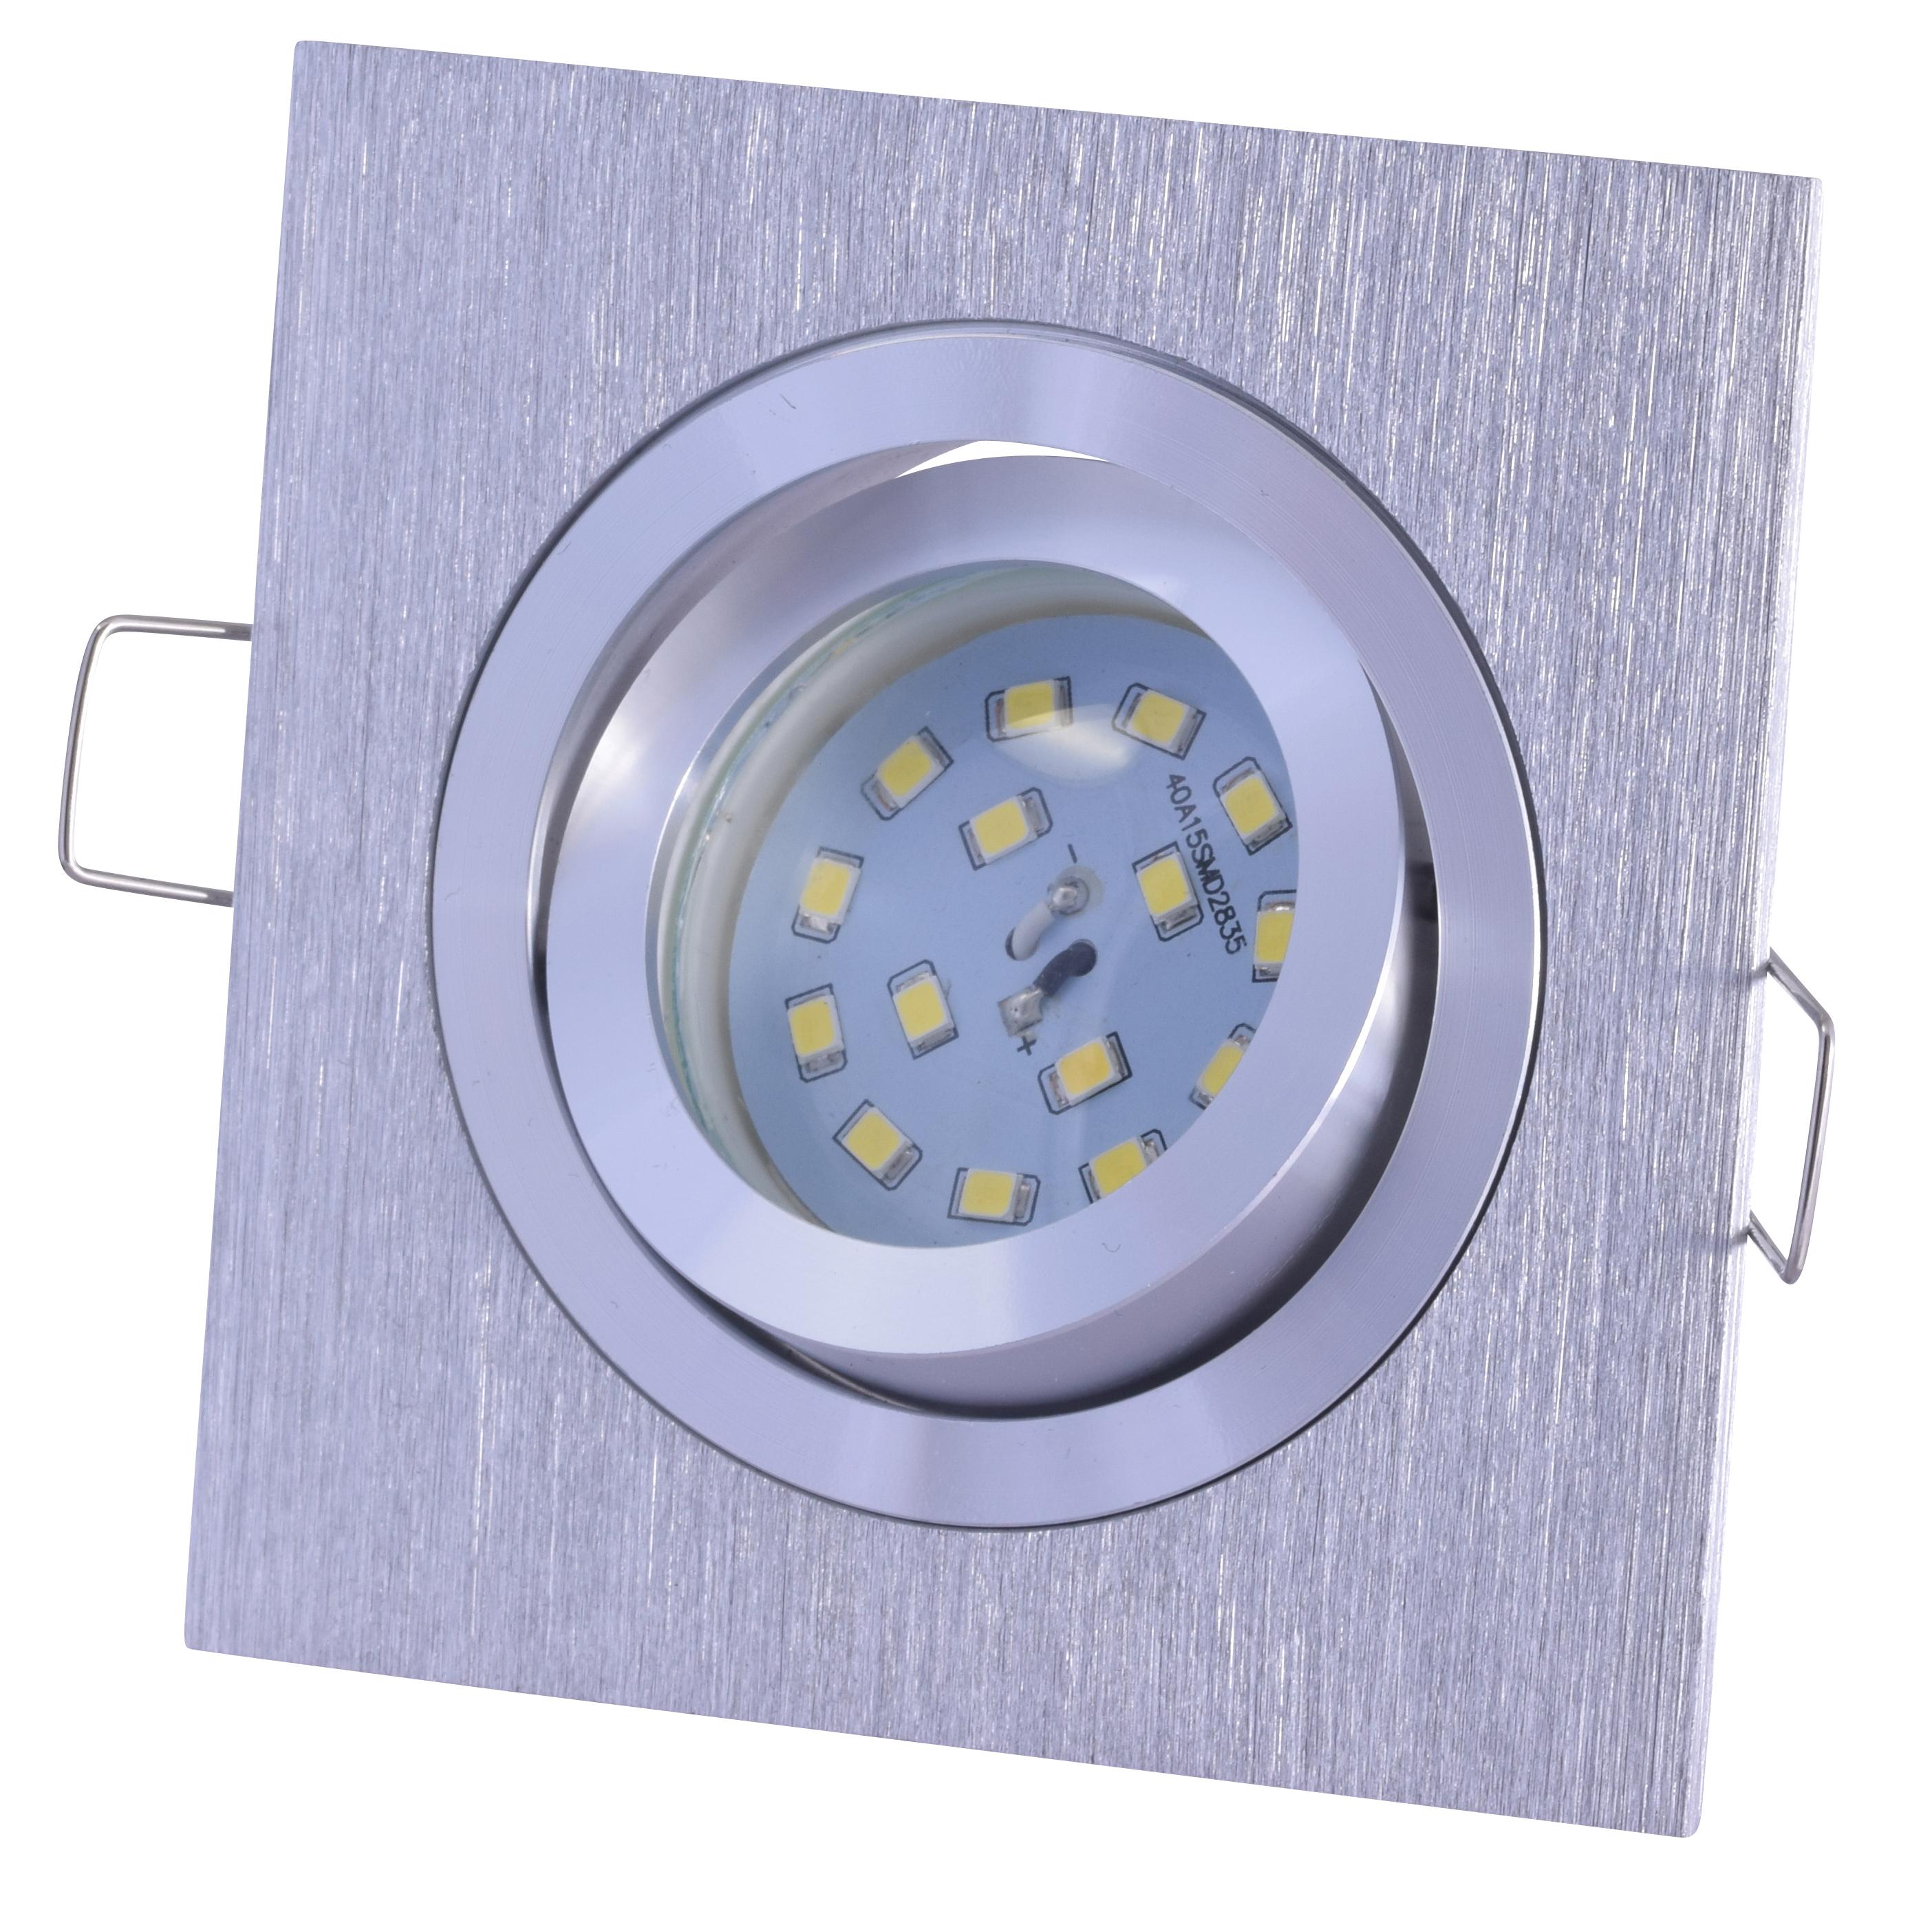 5w einbauleuchte nick ultra flaches led leuchtmittel 230v aluminium geb rstet. Black Bedroom Furniture Sets. Home Design Ideas